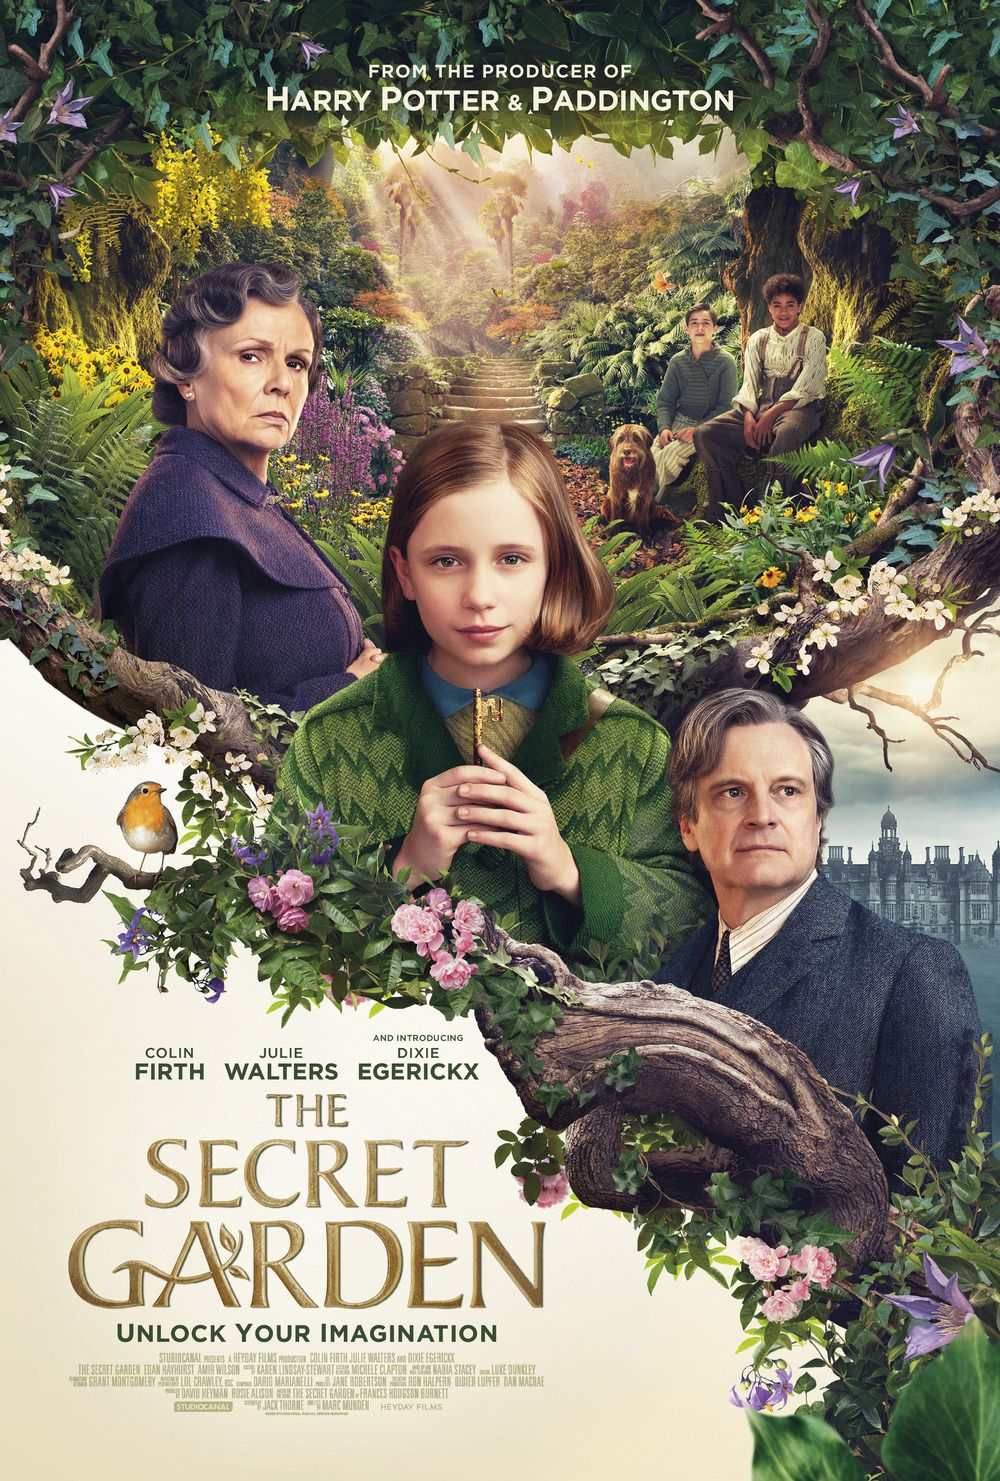 The Secret Garden in 2020 Secret garden, The secret